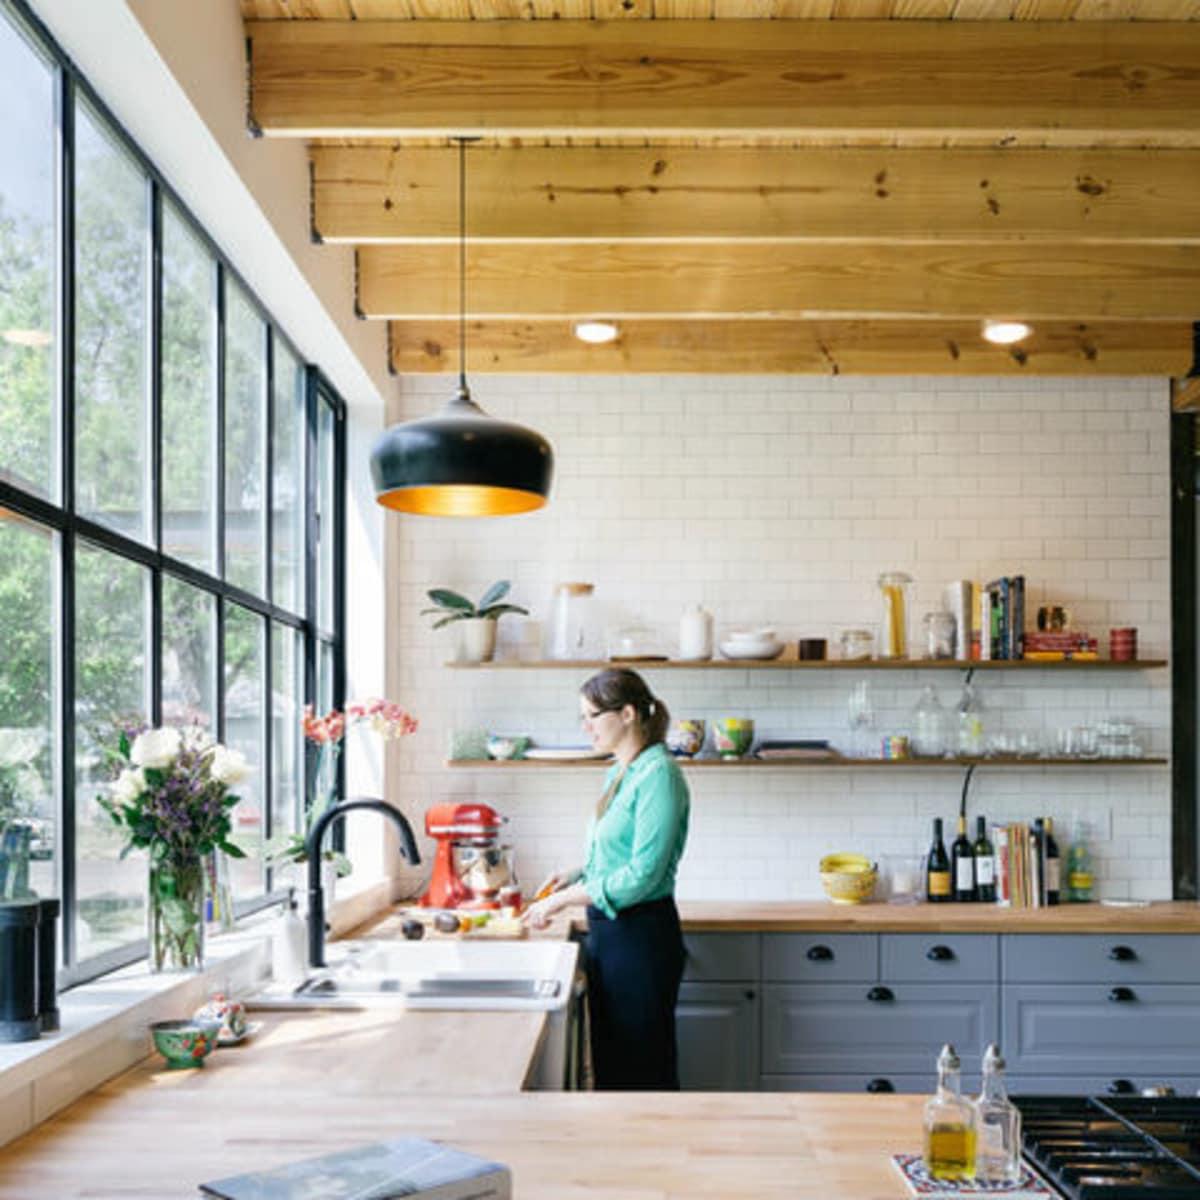 Austin home house Houzz DIY modern Texas farmhouse Garden St kitchen